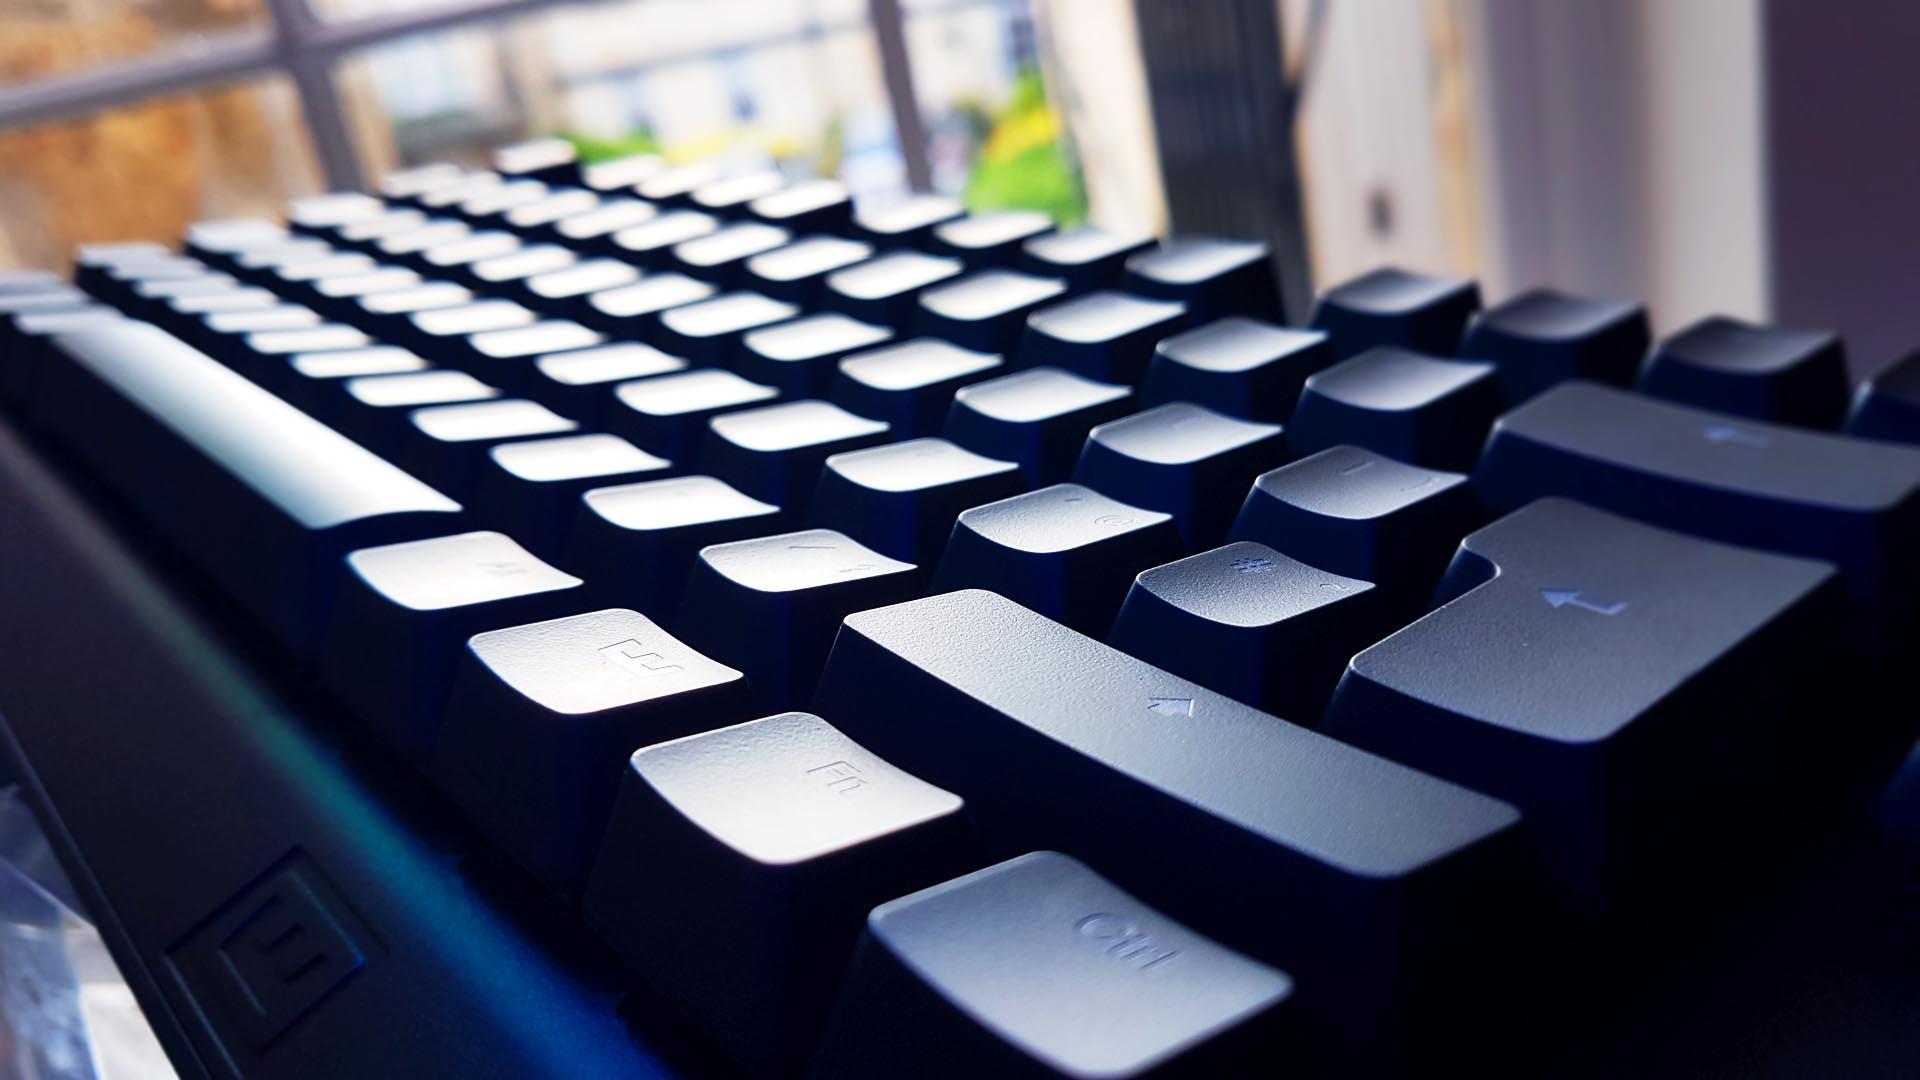 Best gaming keyboard 2019 (August) | PCGamesN